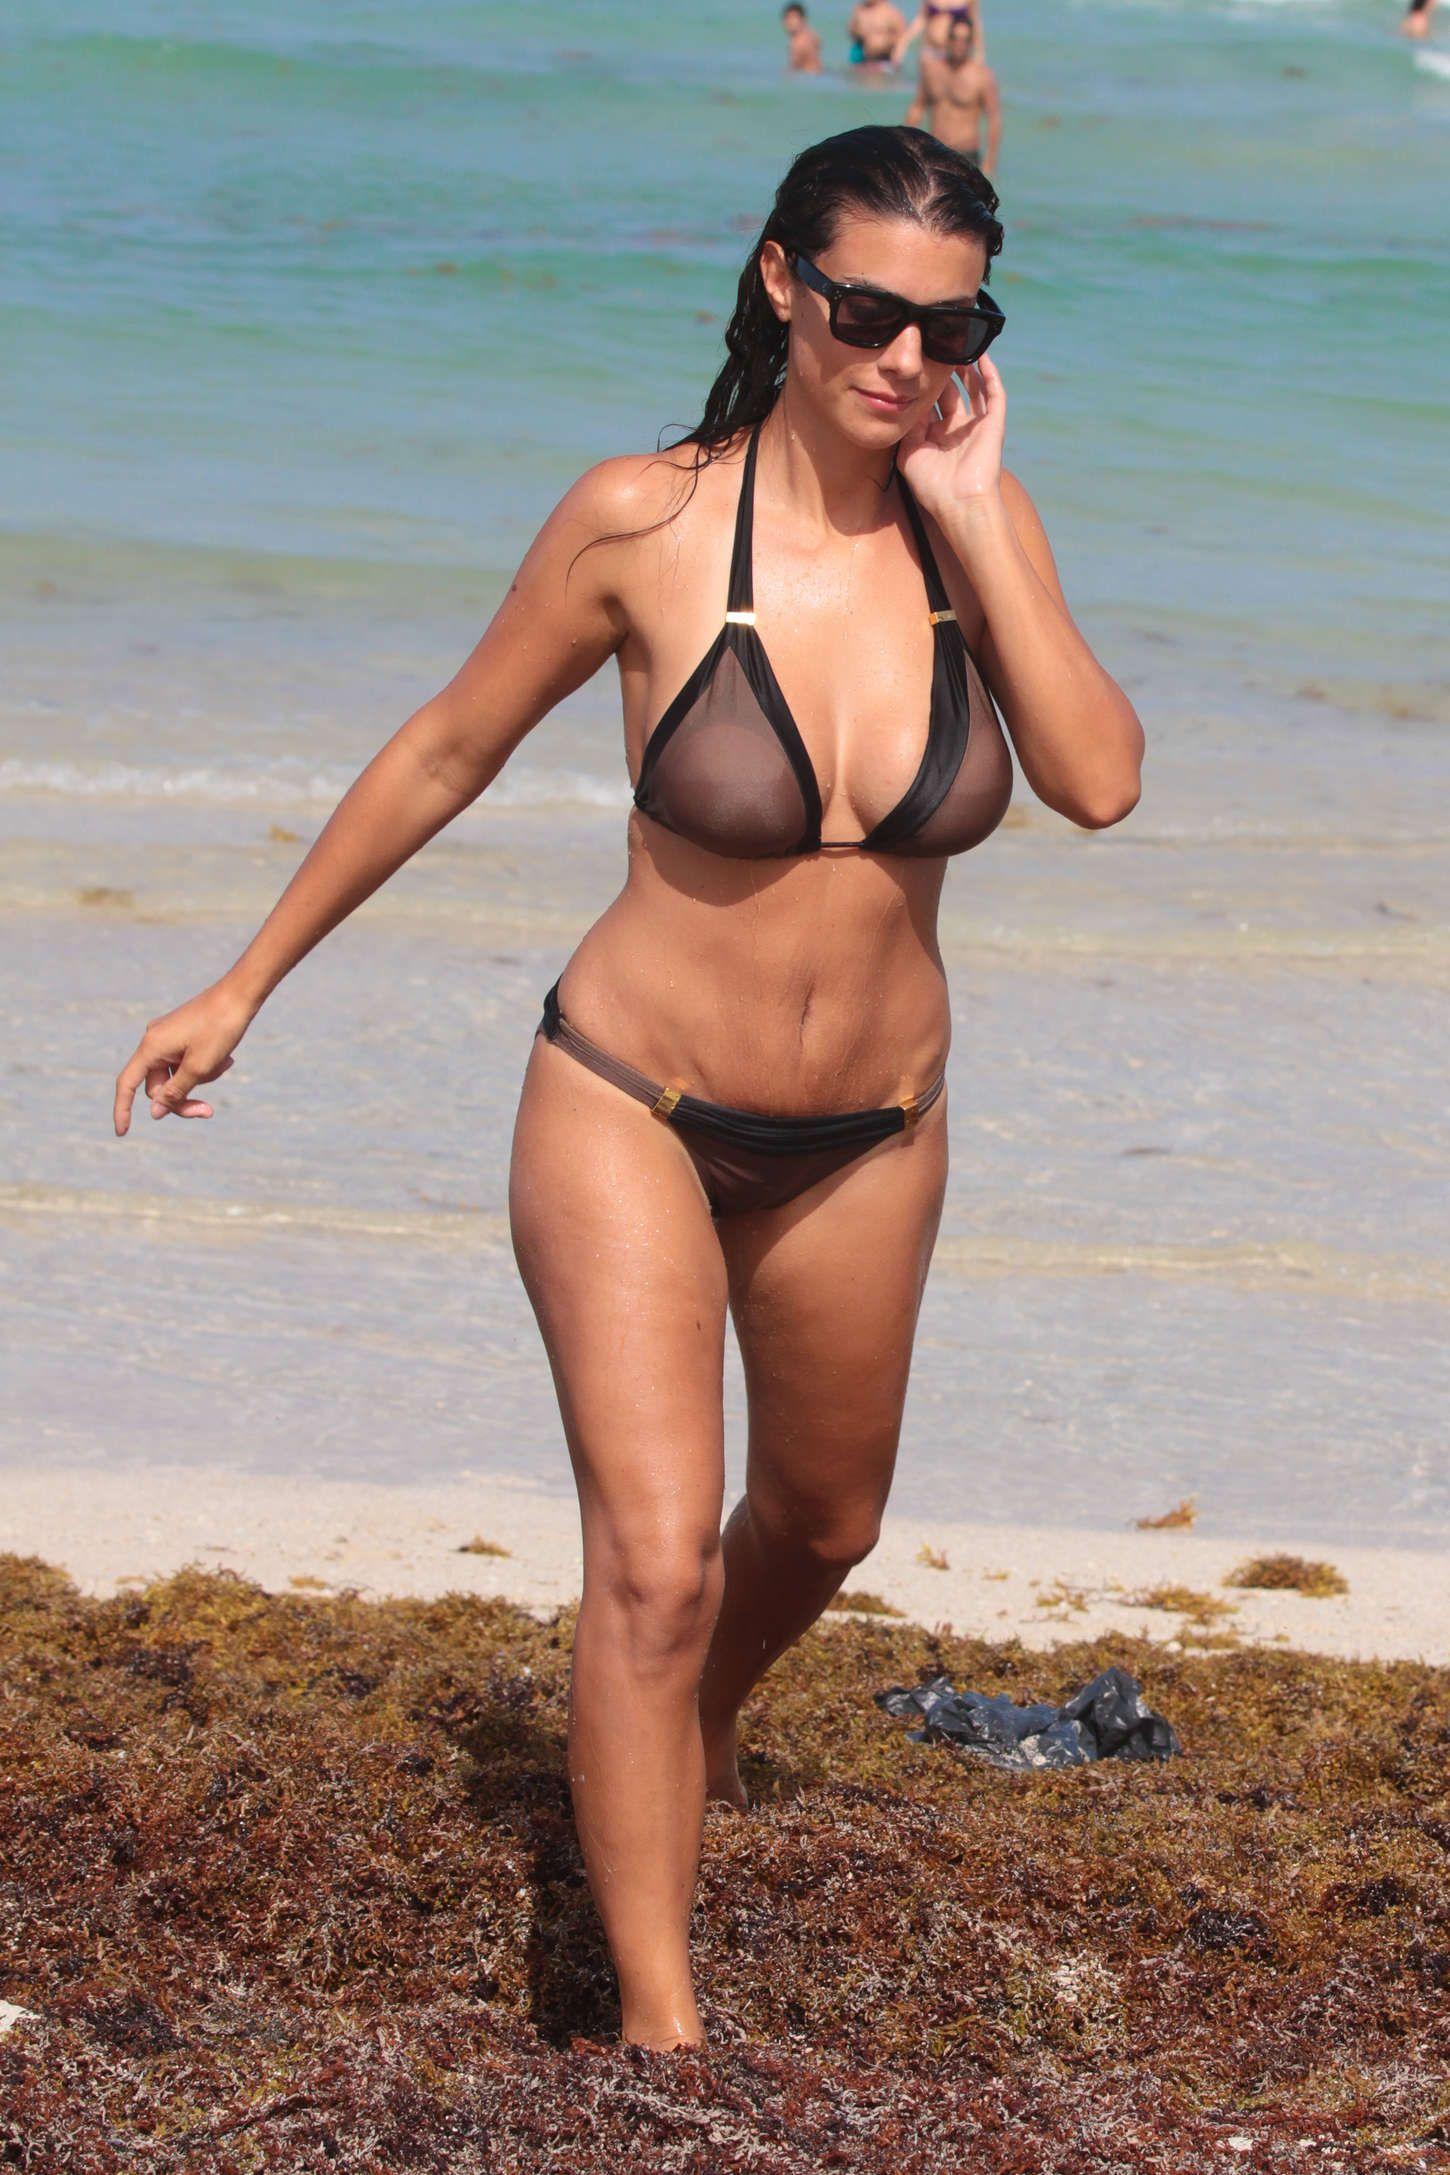 Hot Ludivine Sagna nudes (15 photo), Ass, Fappening, Feet, see through 2006